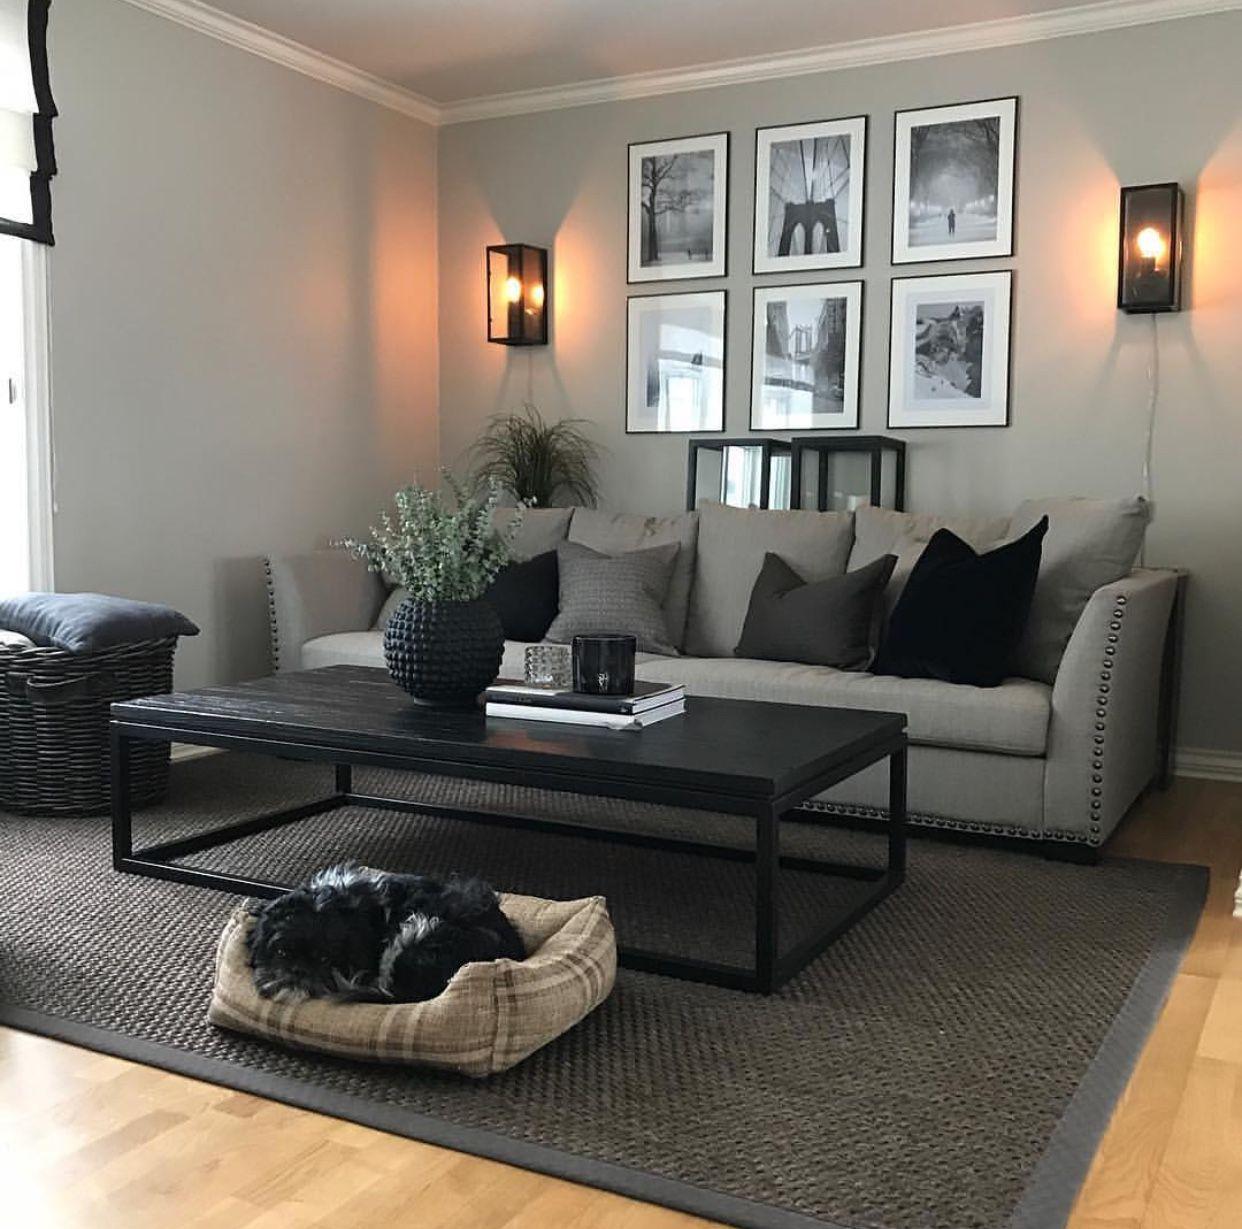 neutrallllllsss 🖤  Décoration salon appartement, Déco maison